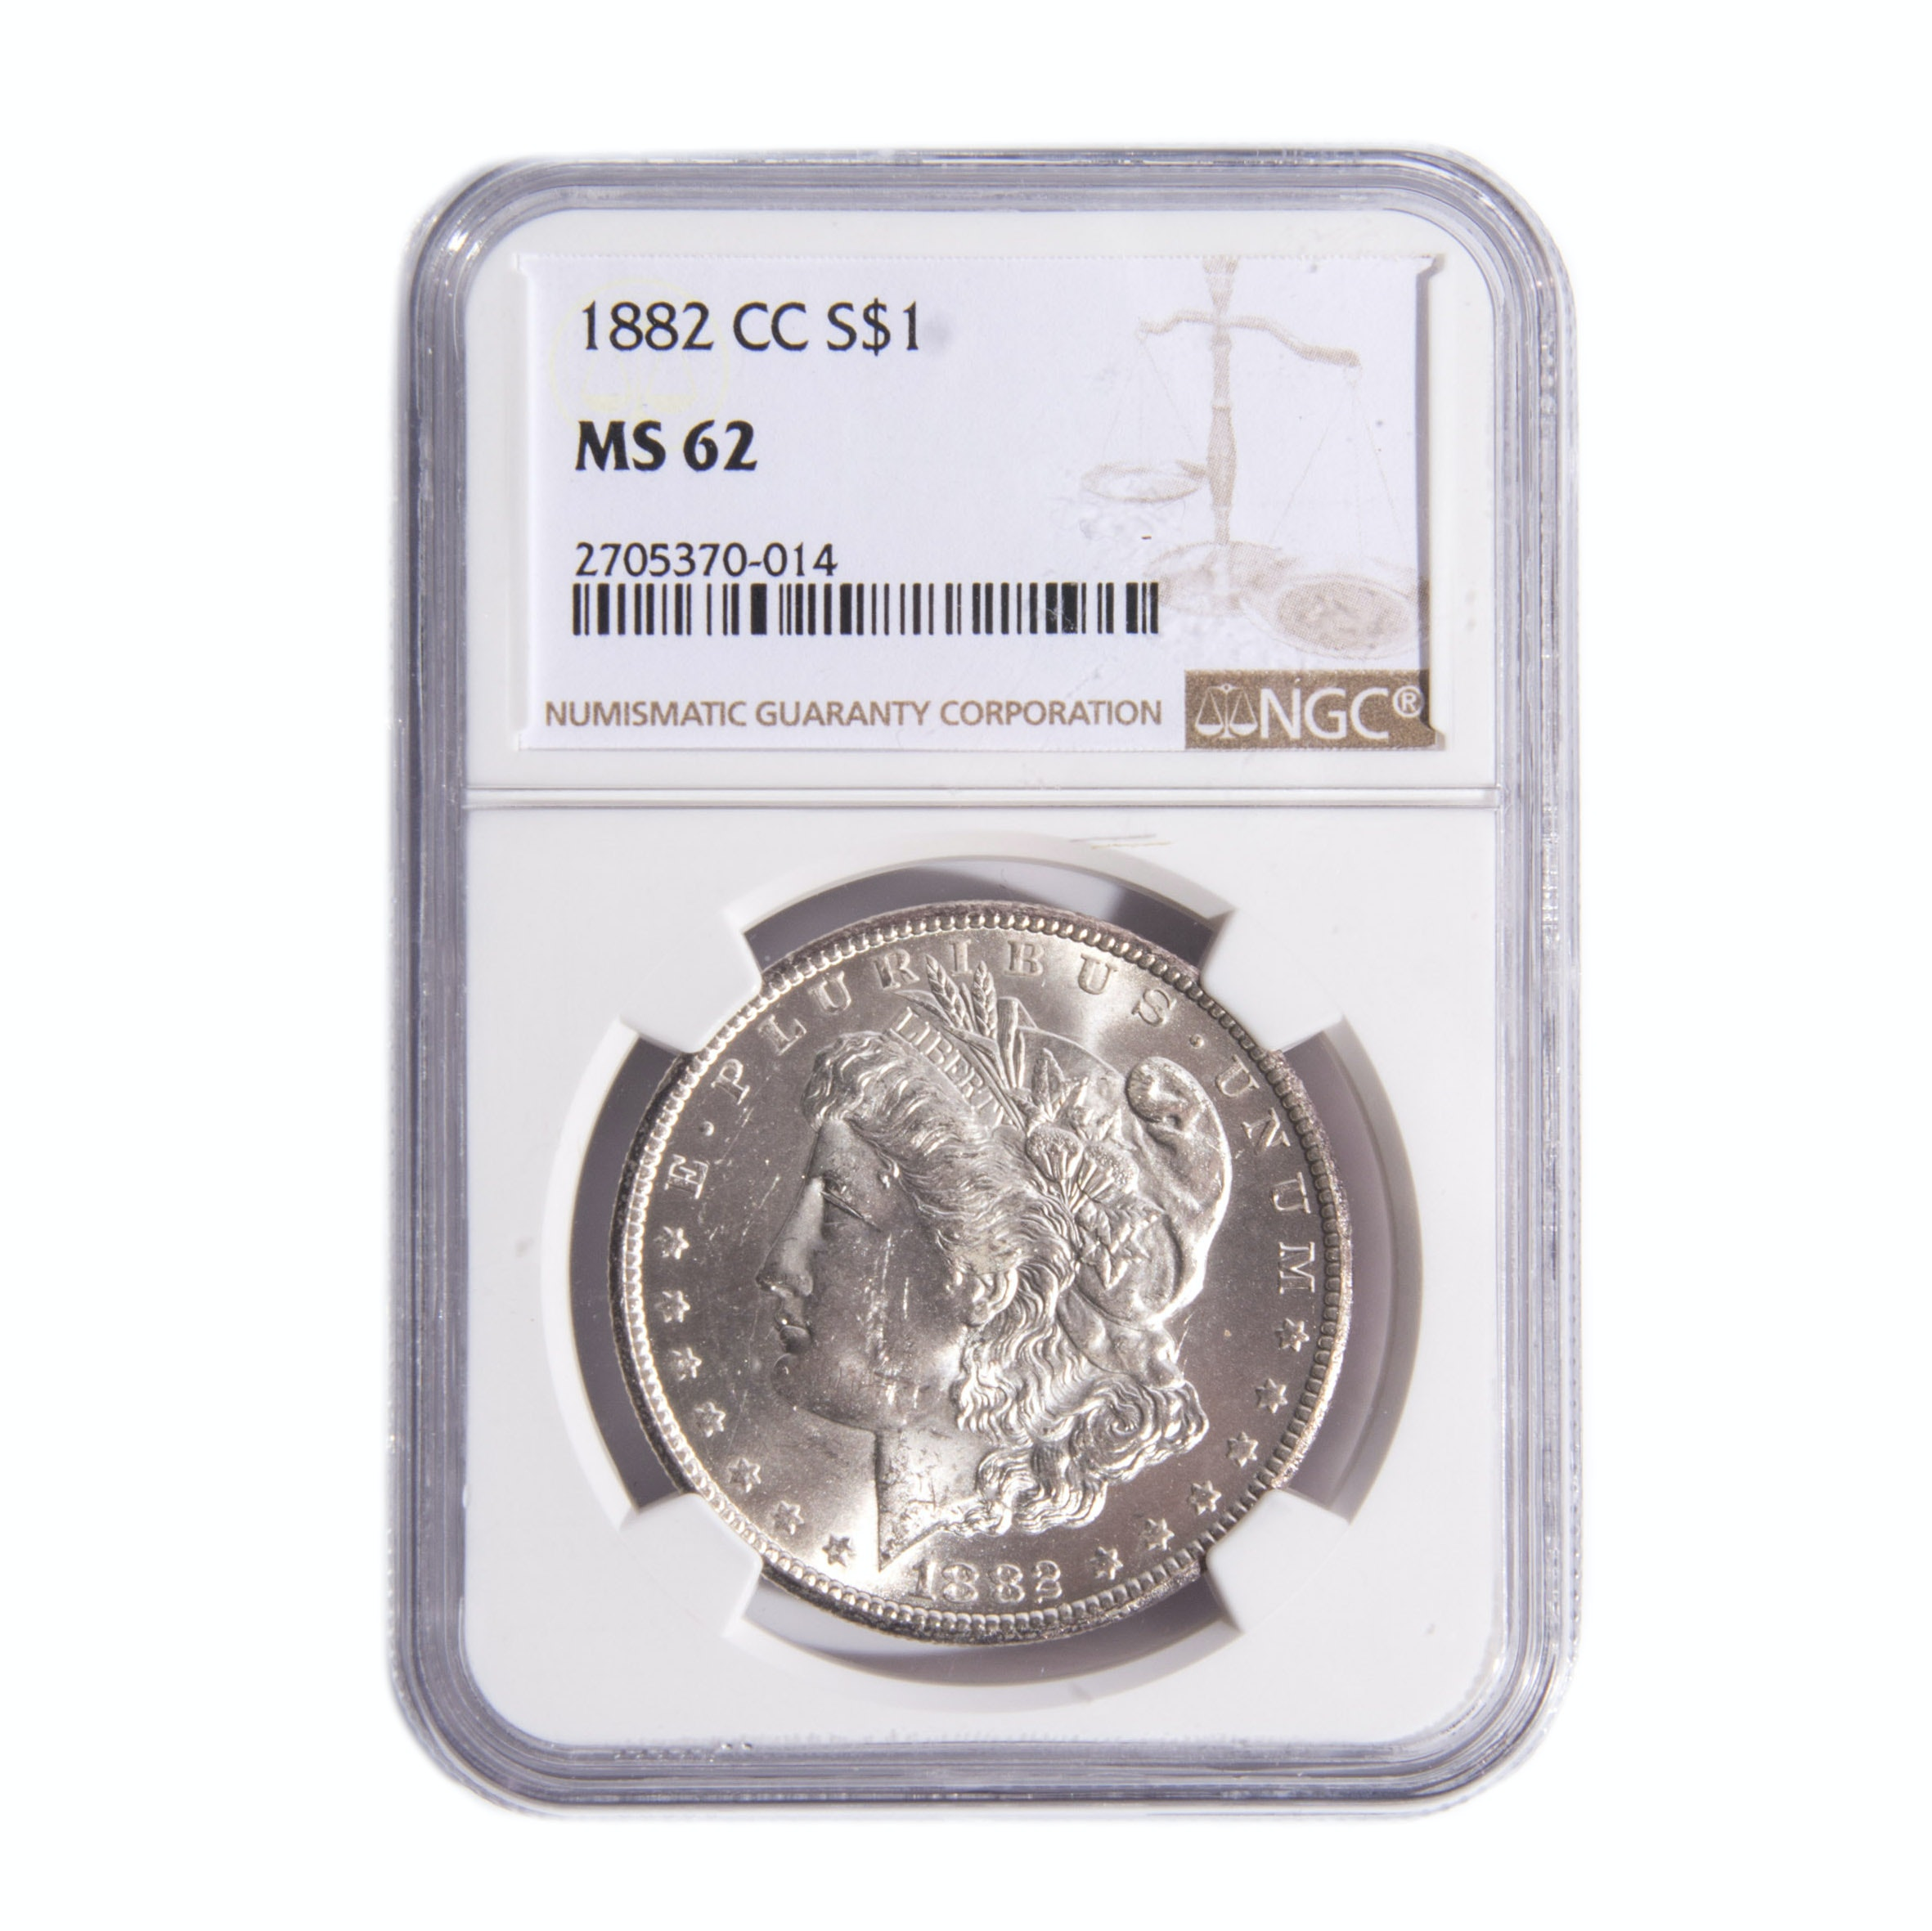 1882-CC Morgan Silver Dollar NGC Graded M62